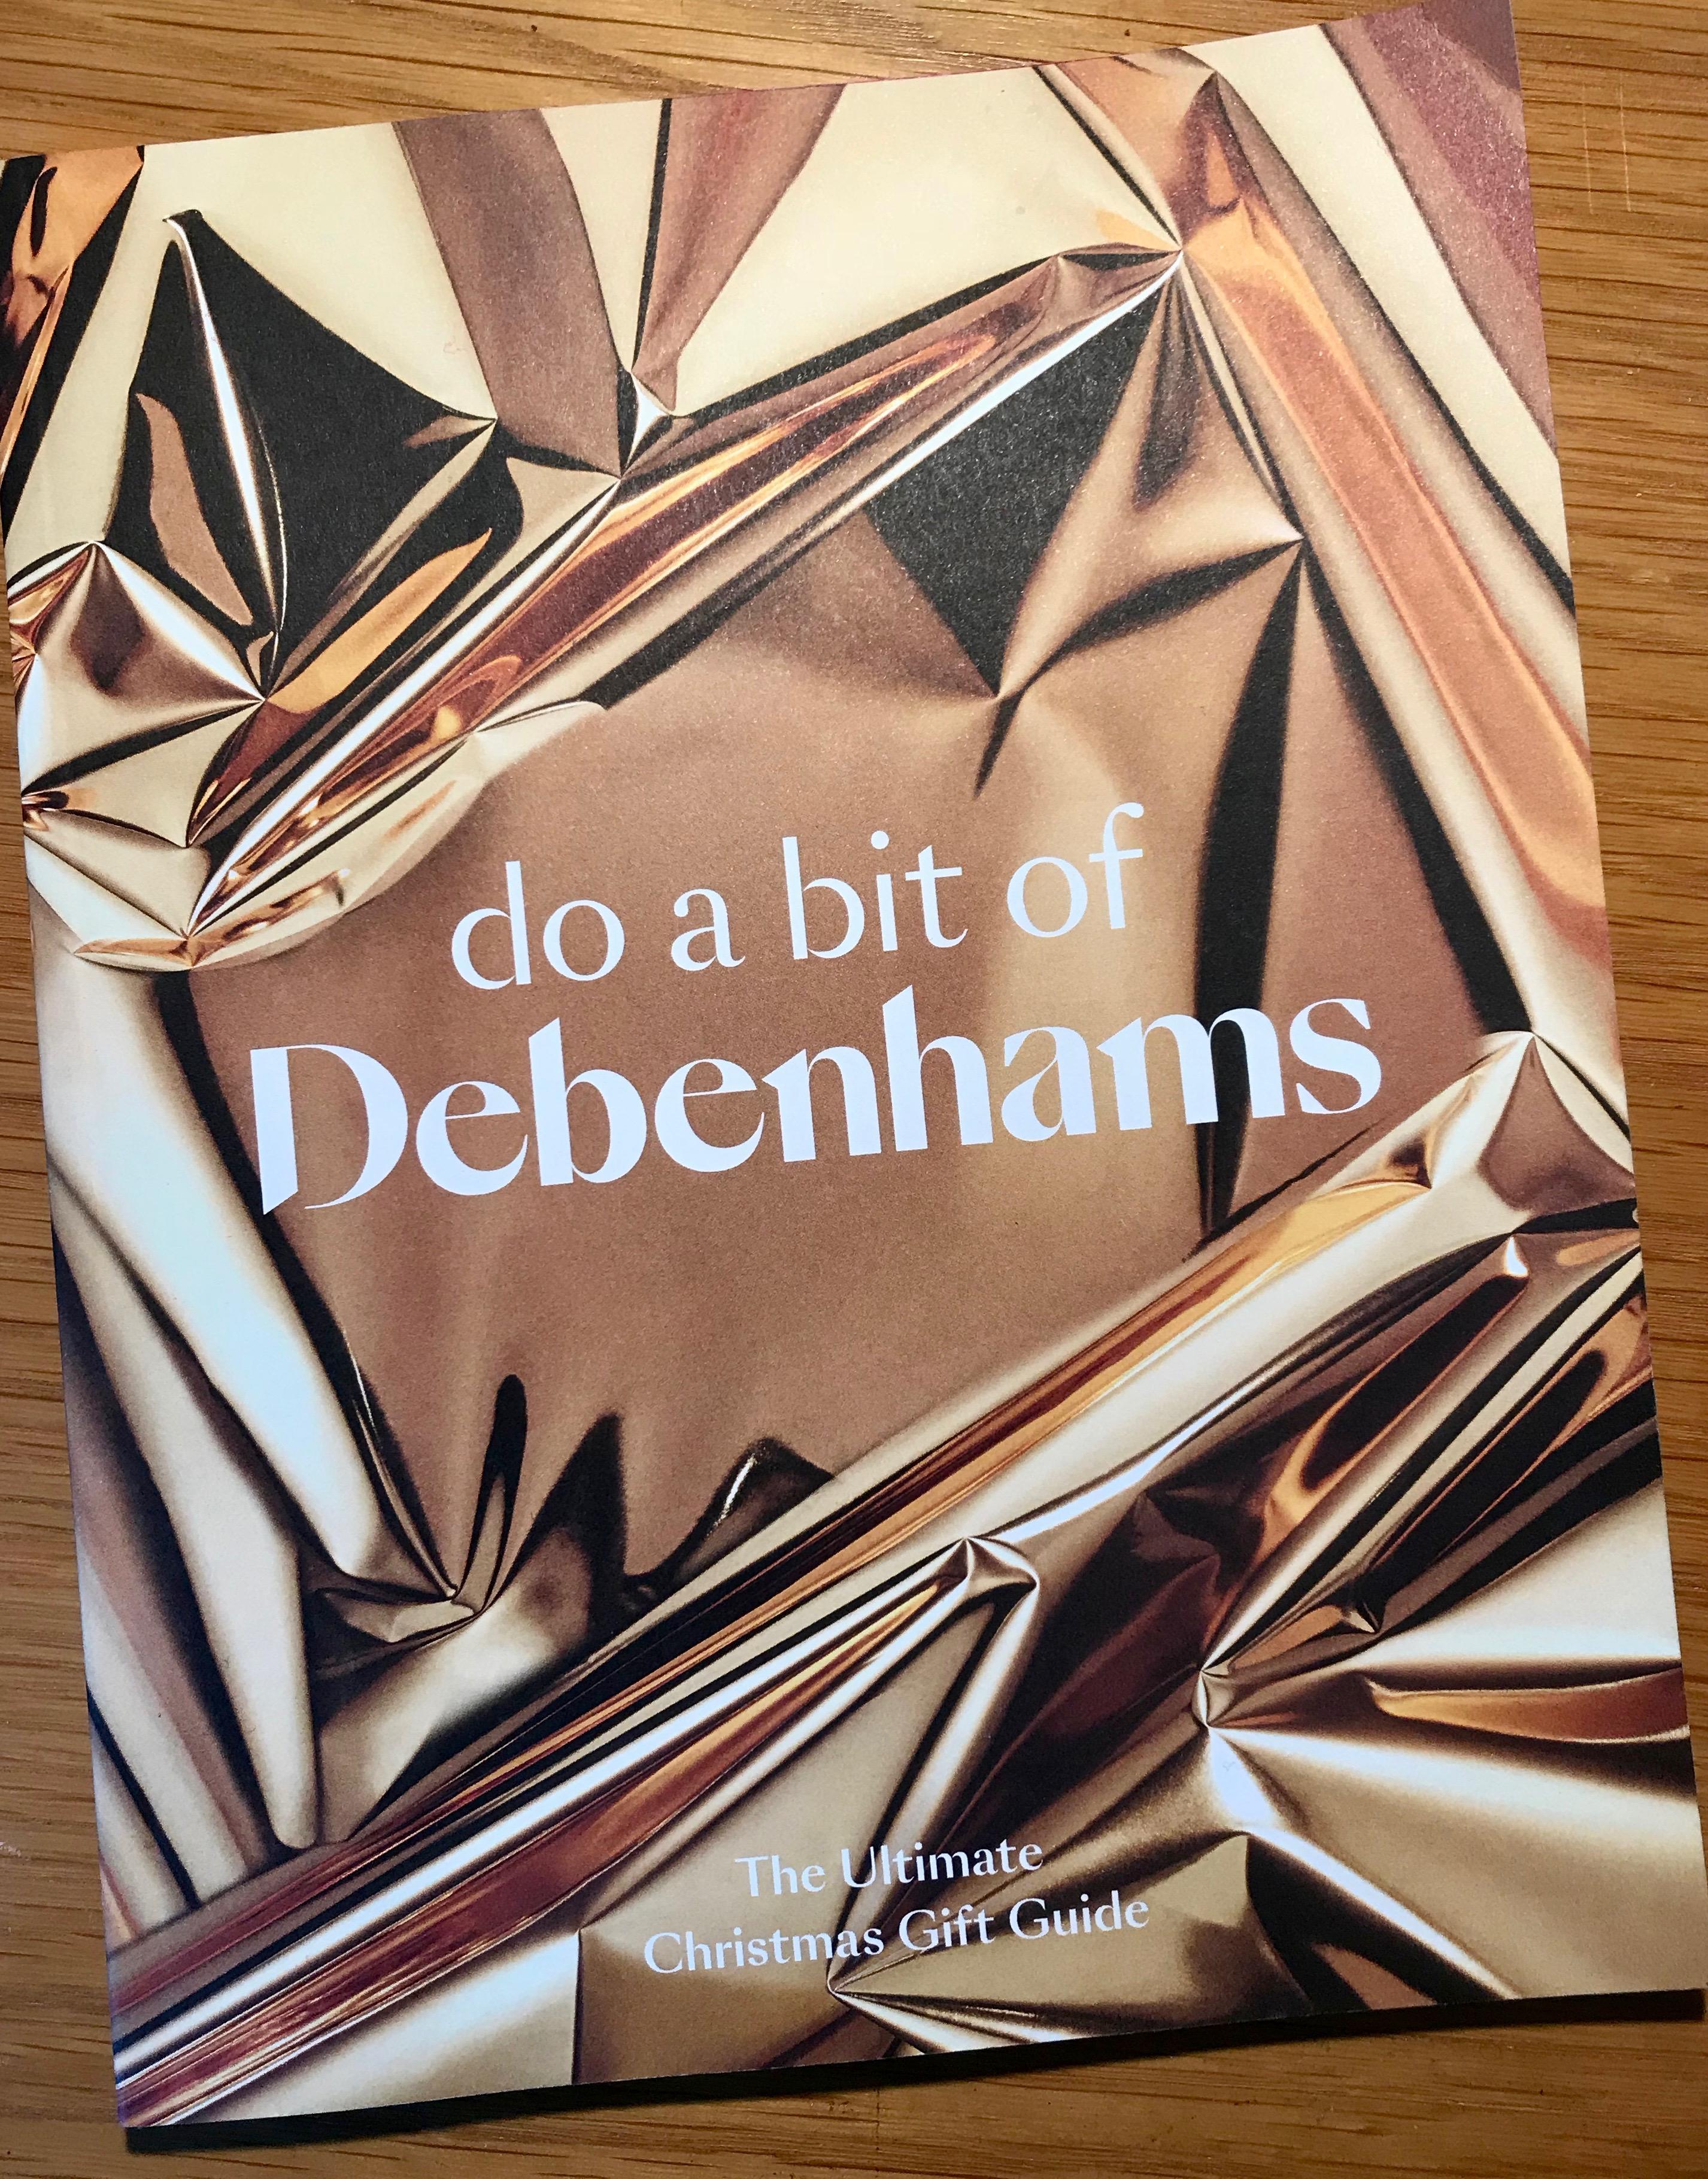 Debenhams Christmas Gift Guide 2018